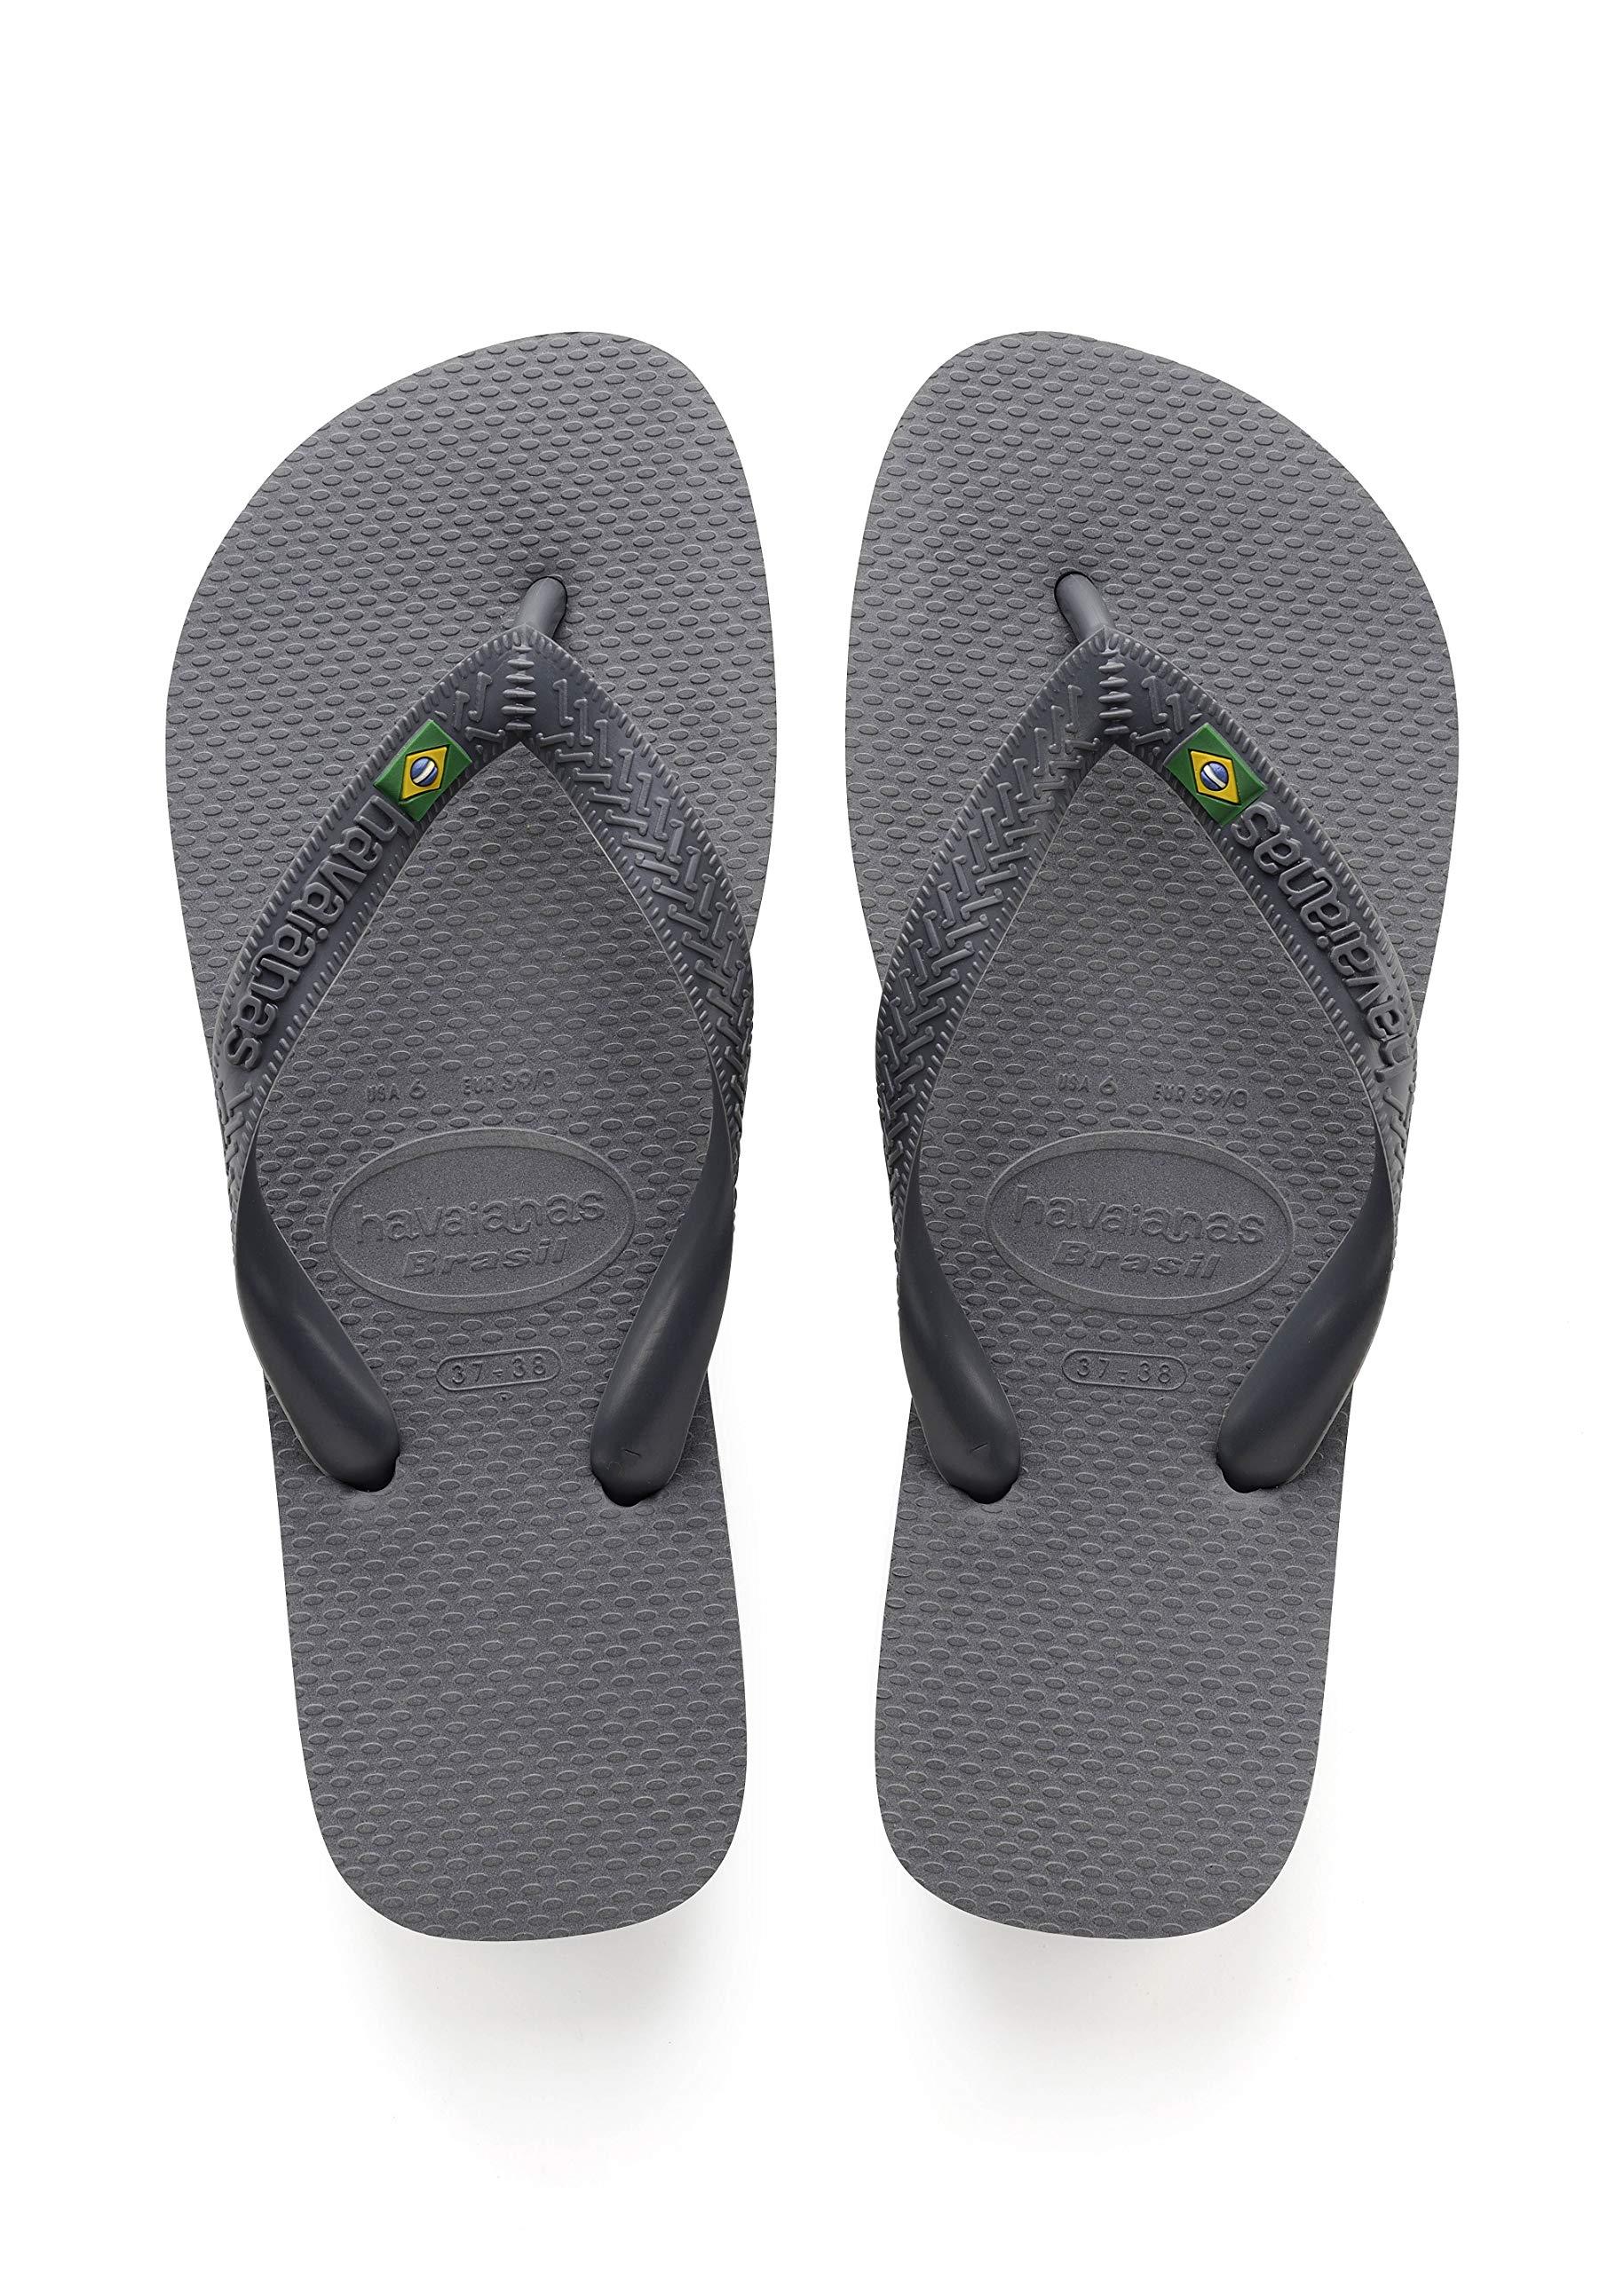 8e613b439c0bac Galleon - Havaianas Brasil Logo Unisex Adult s Flip Flops